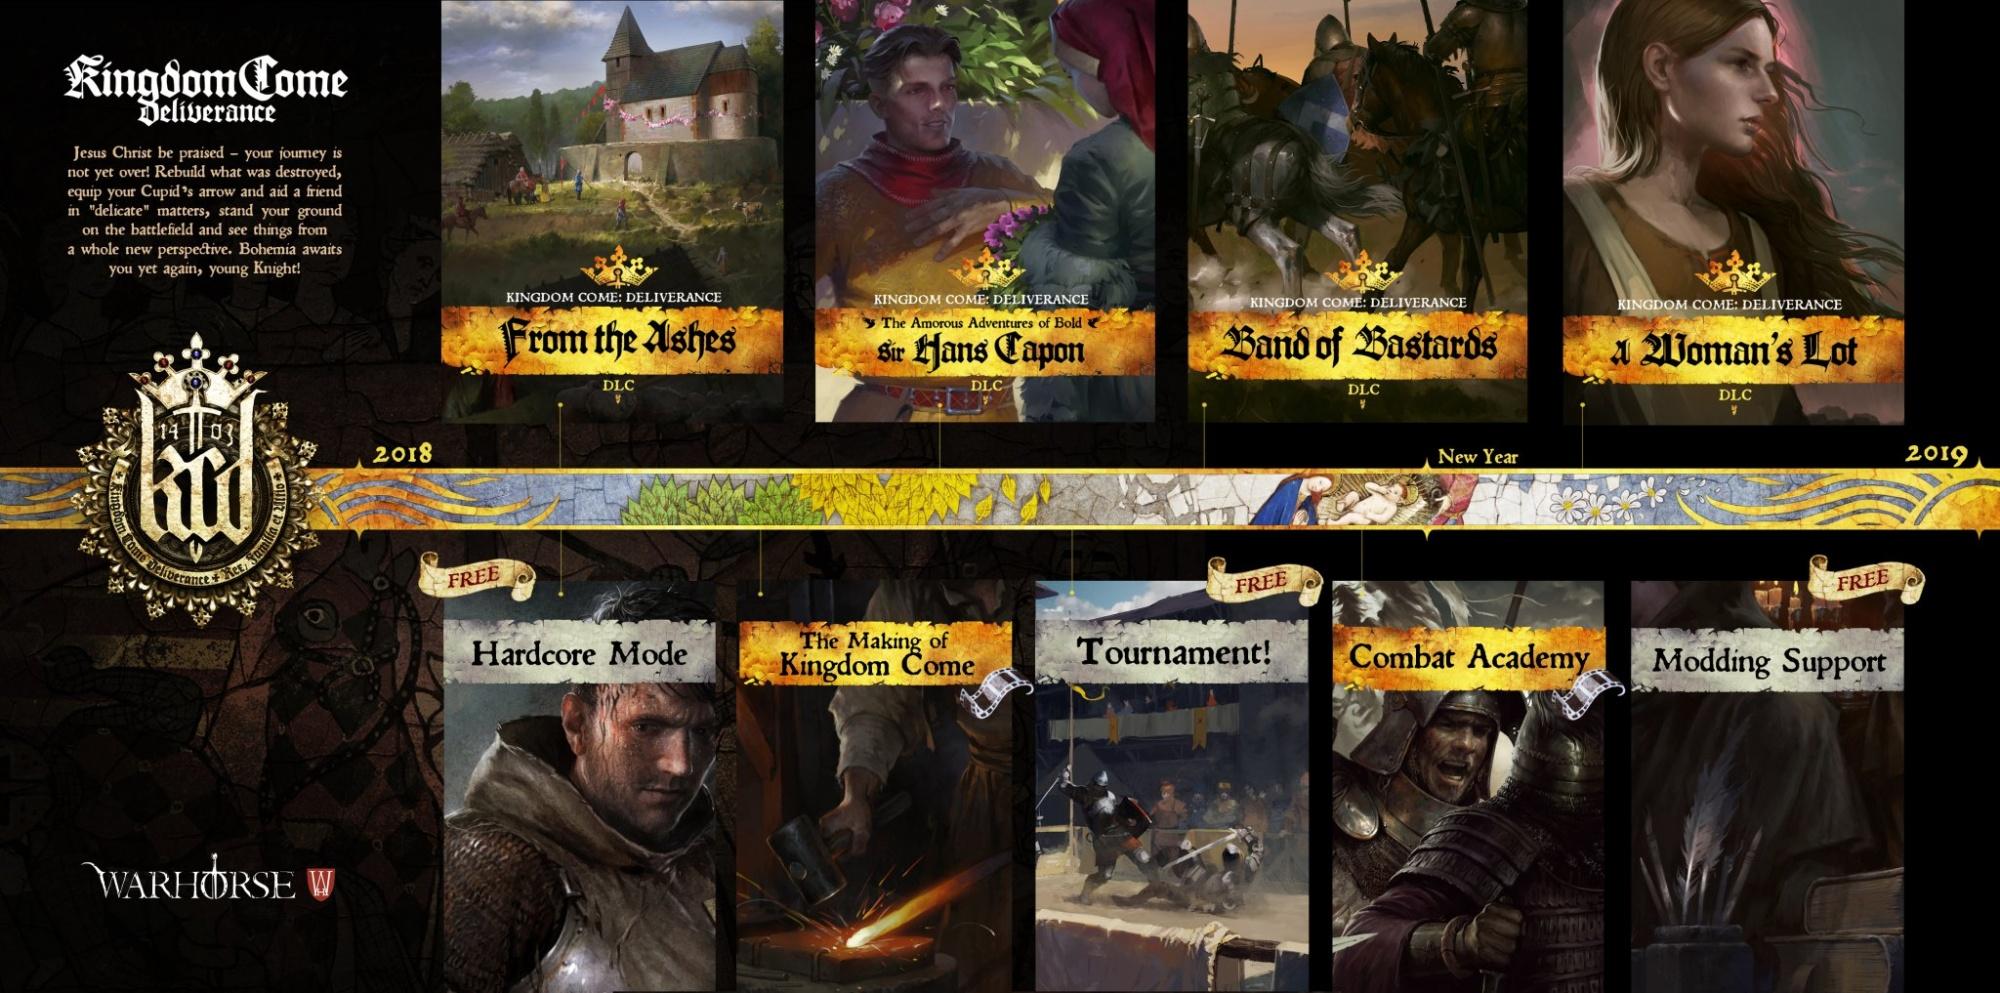 Kingdom Come Deliverance Karte Mit Allen Schätzen.E3 2018 Kingdom Come Deliverance Mit Dlc Informationen News